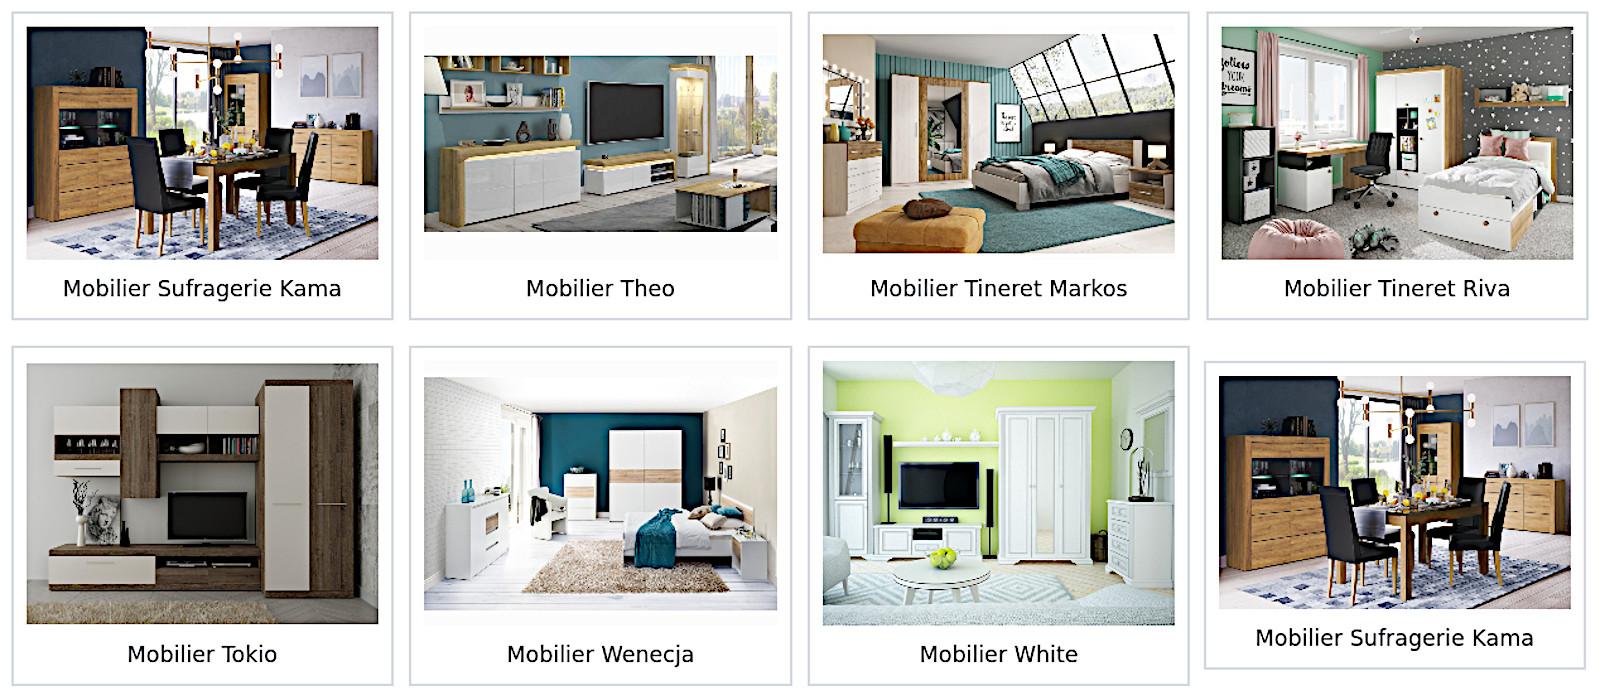 Colectii mobila Kama, Theo, Markos, Riva, Tokio, Wenecja, White de calitate